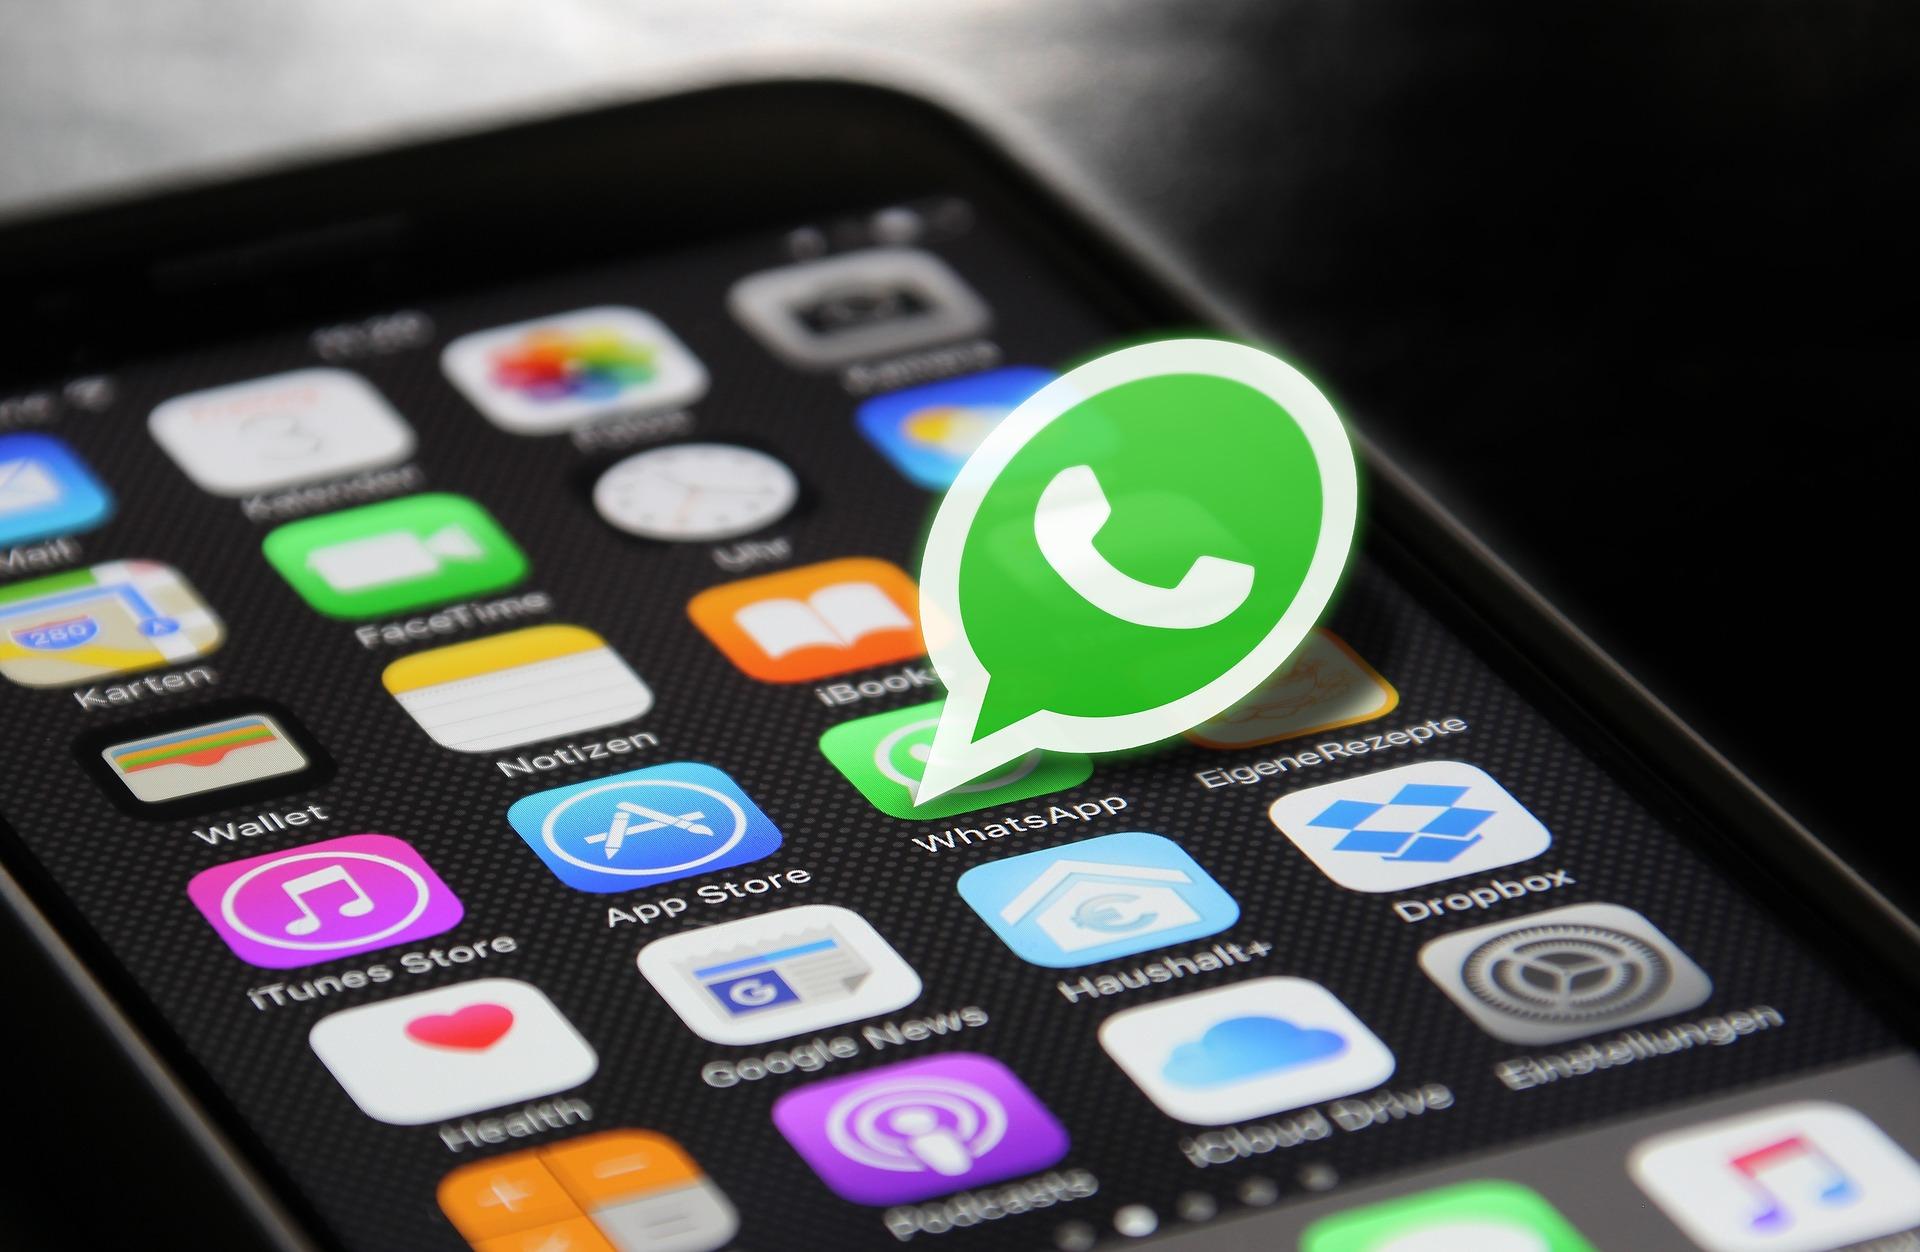 WhatsApp вскоре прекращает работу насмартфонах состарым Android